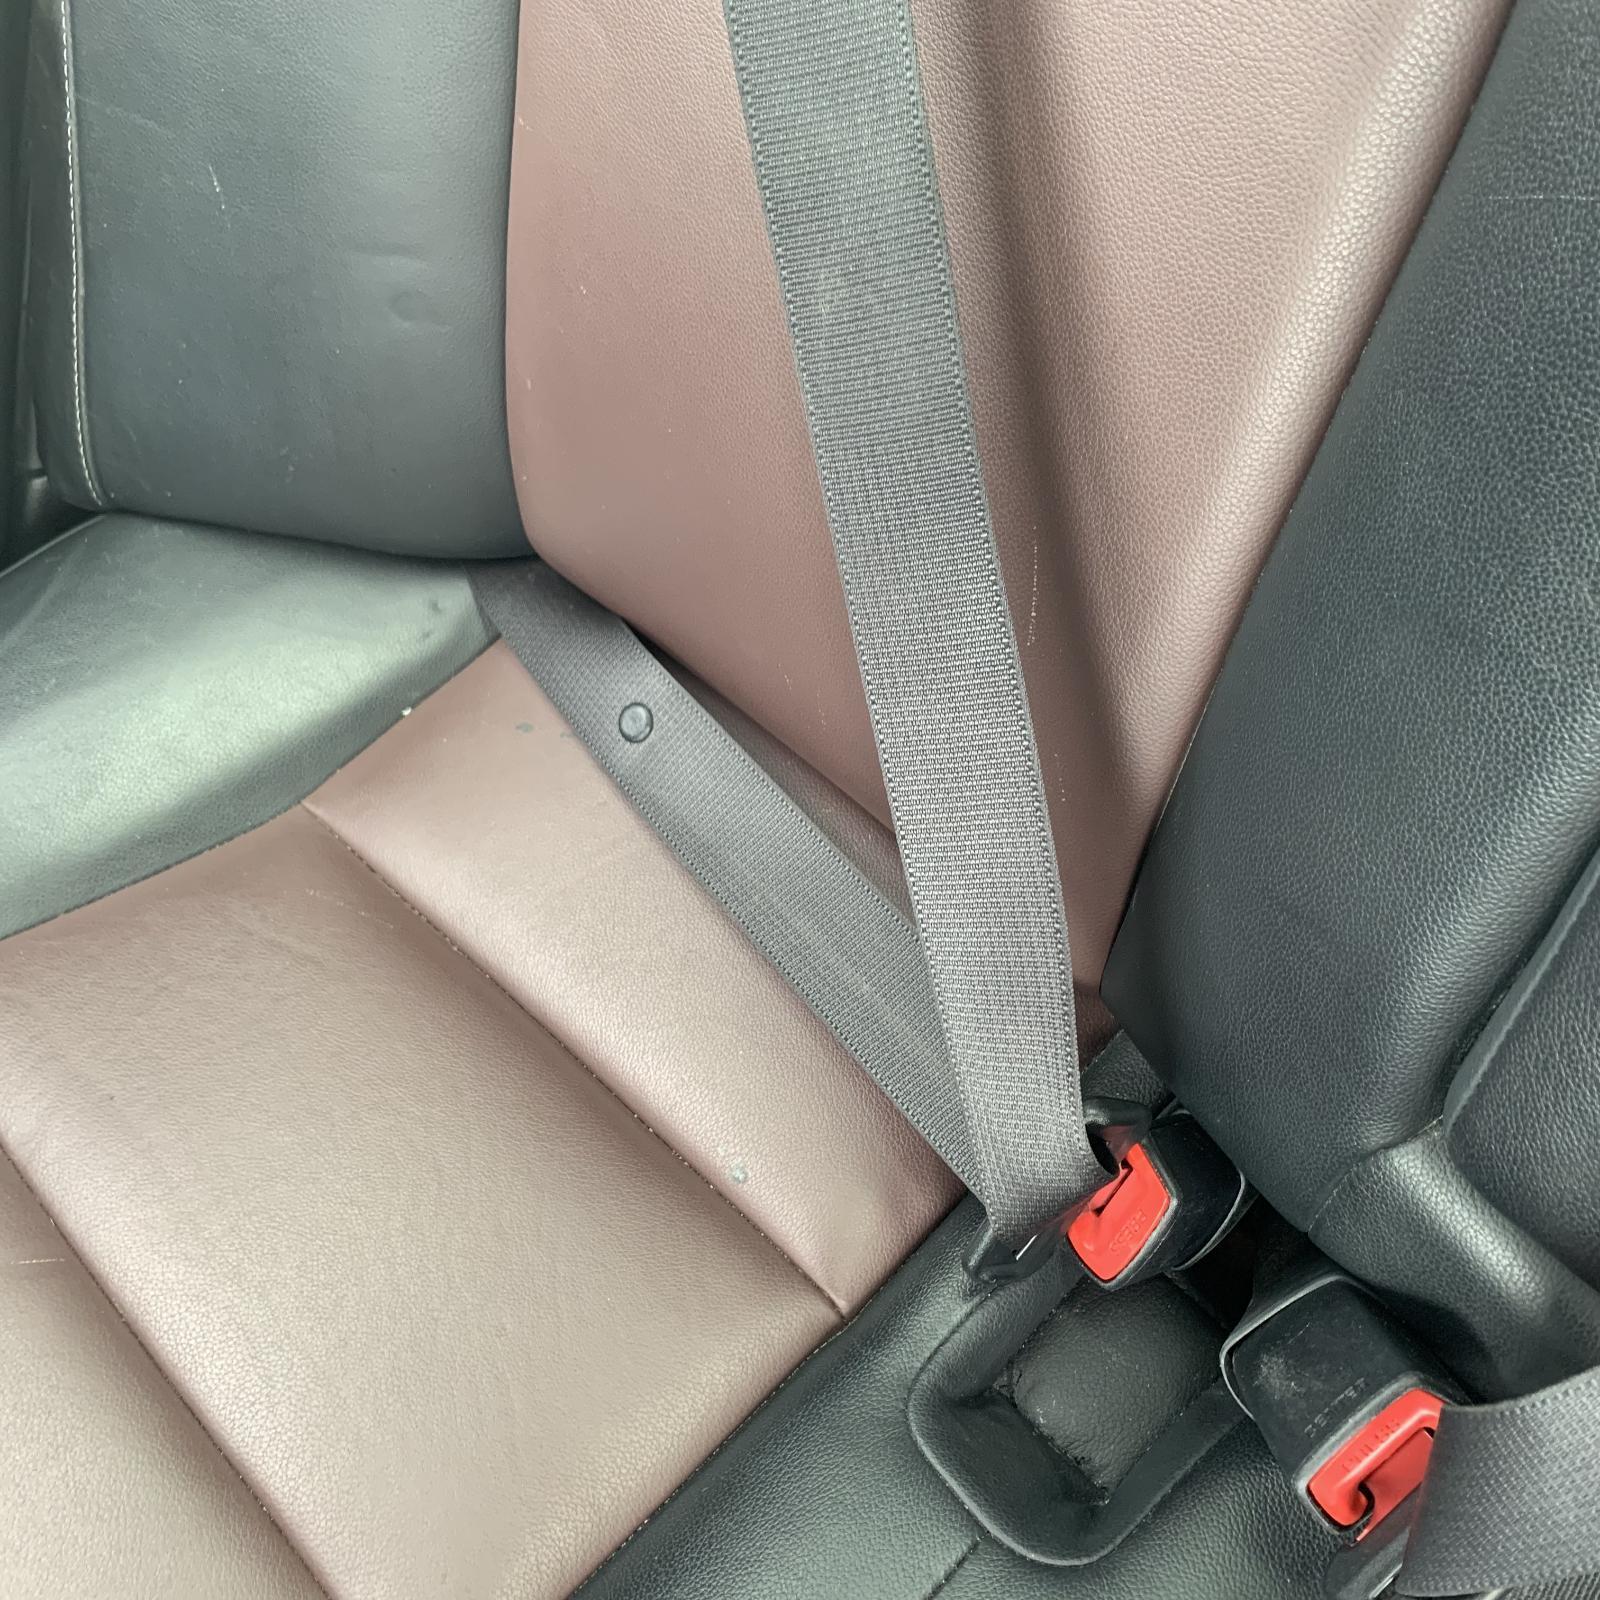 TOYOTA AURION, Seatbelt/Stalk, RH REAR, SEAT BELT STALK ONLY, GSV50R, 04/12-08/17